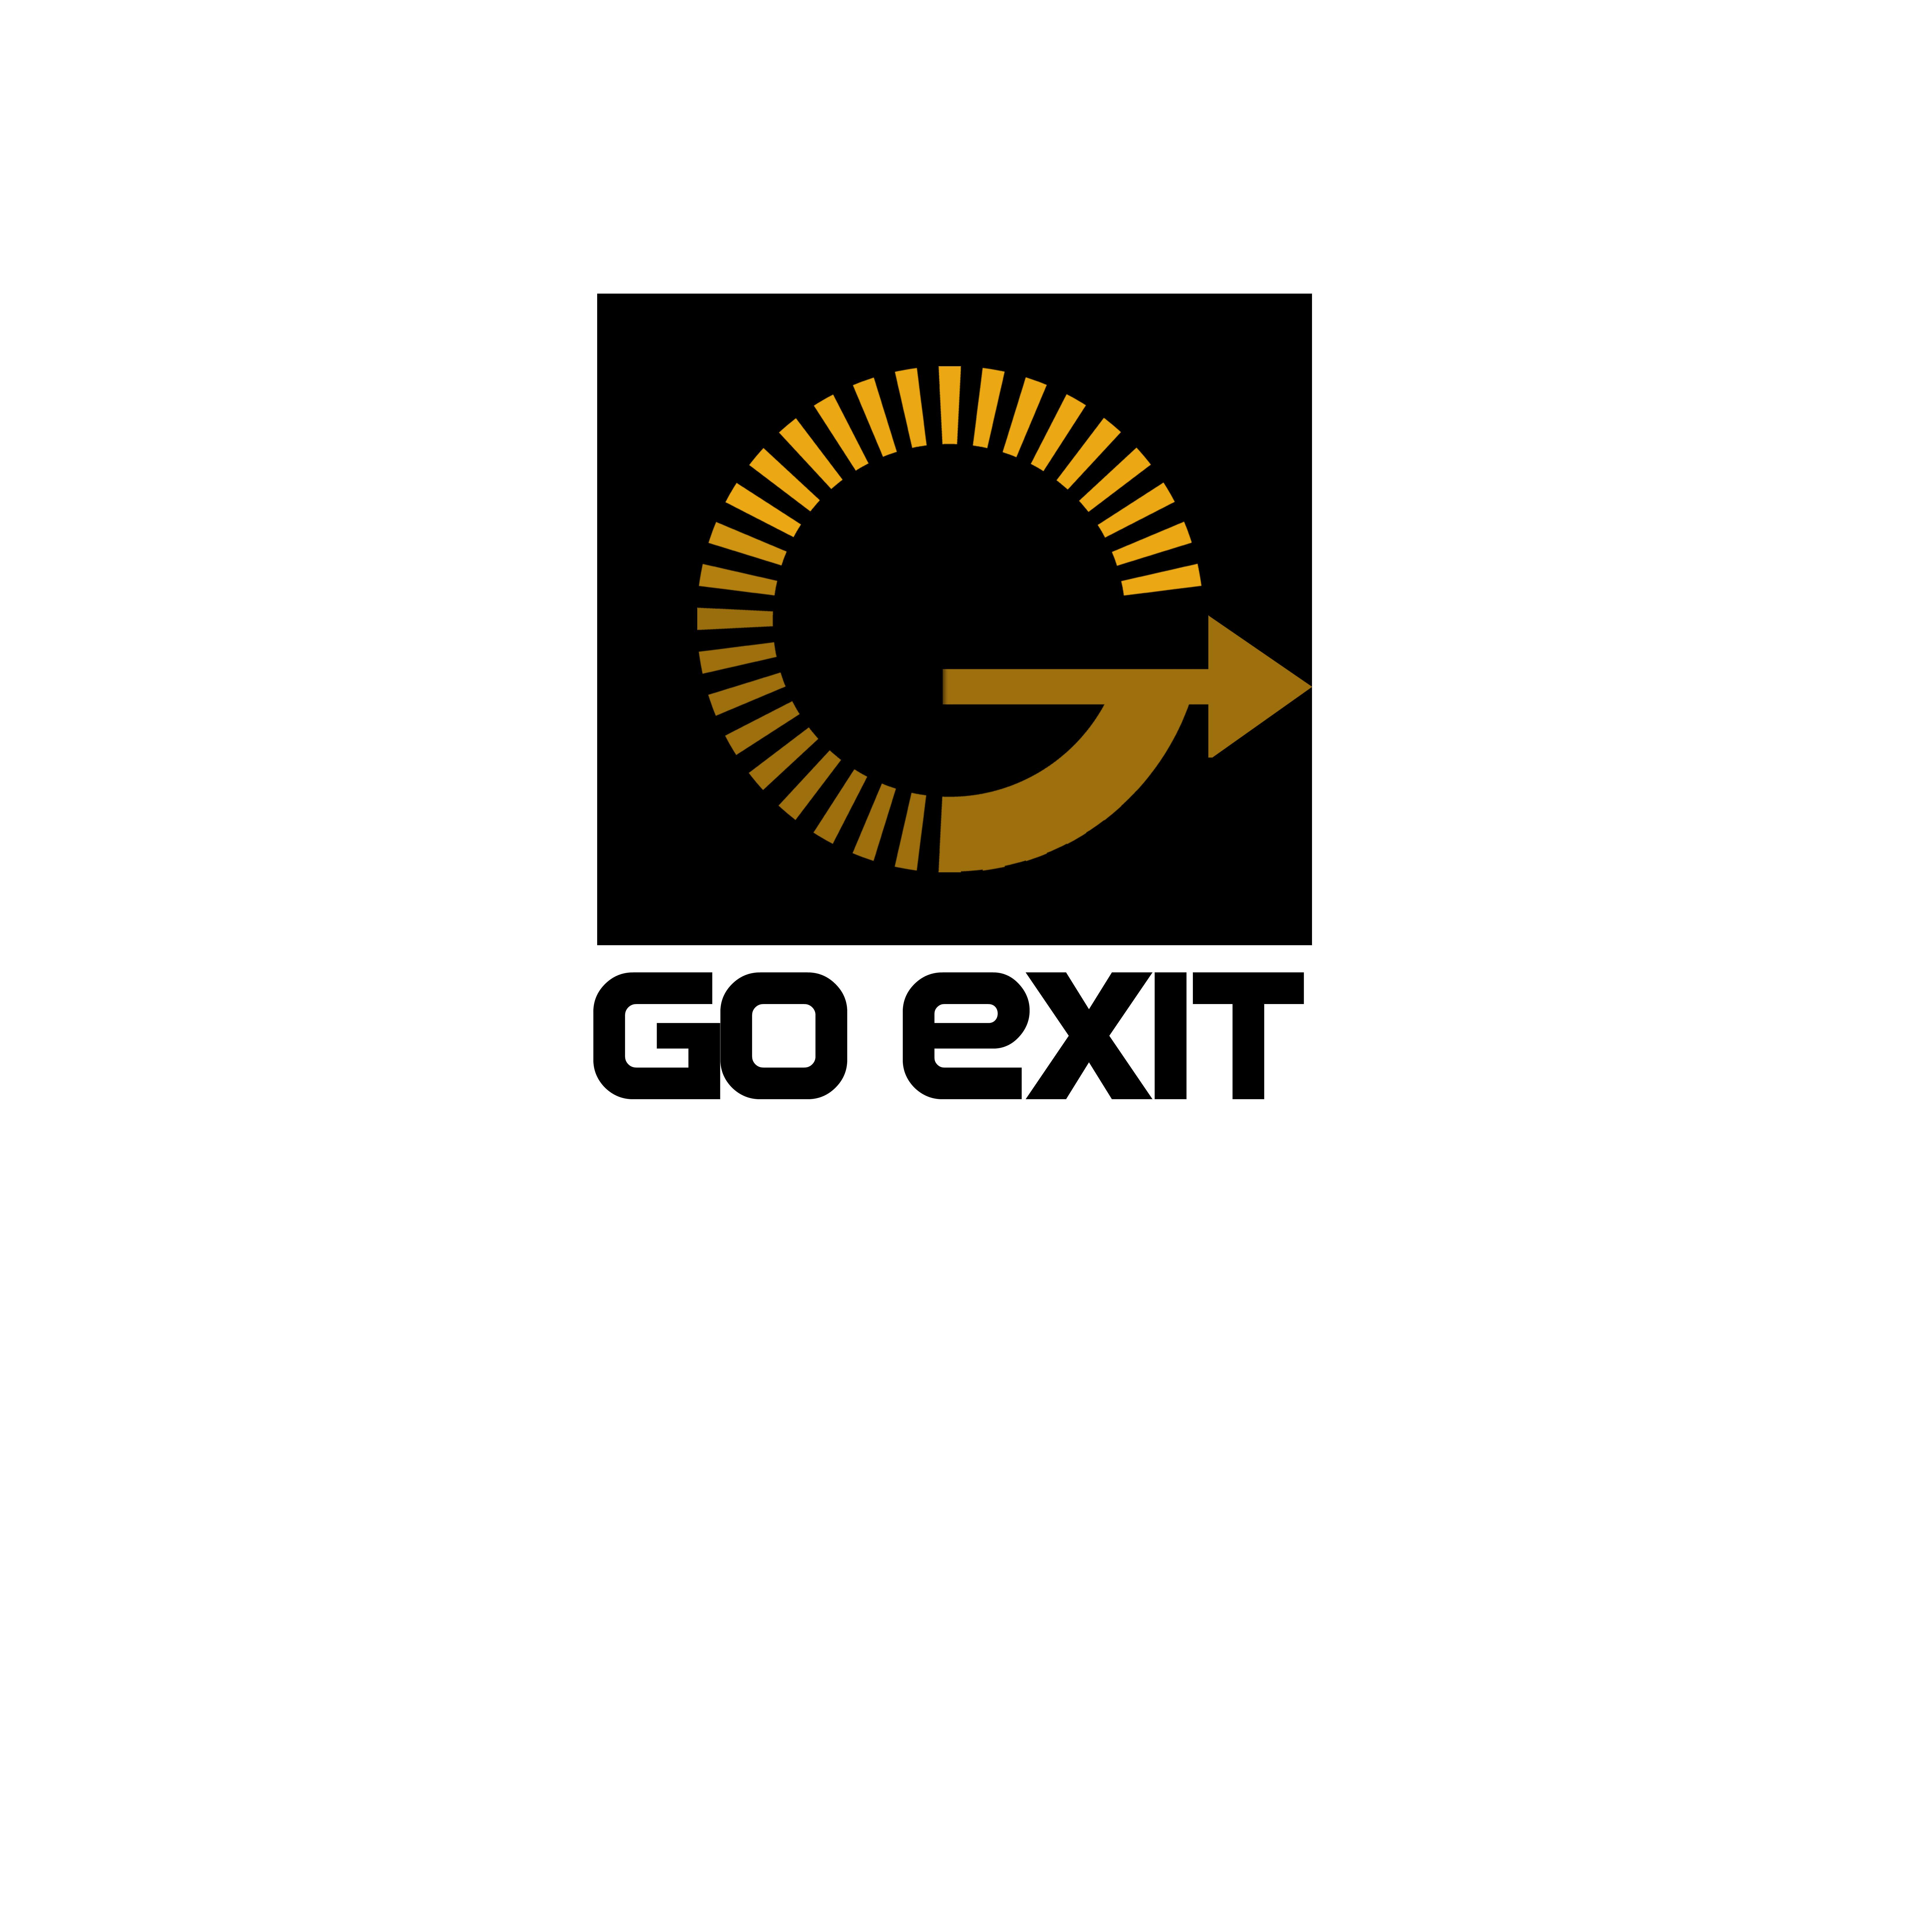 Logo Design by Allan Esclamado - Entry No. 137 in the Logo Design Contest GoExit Logo Design.